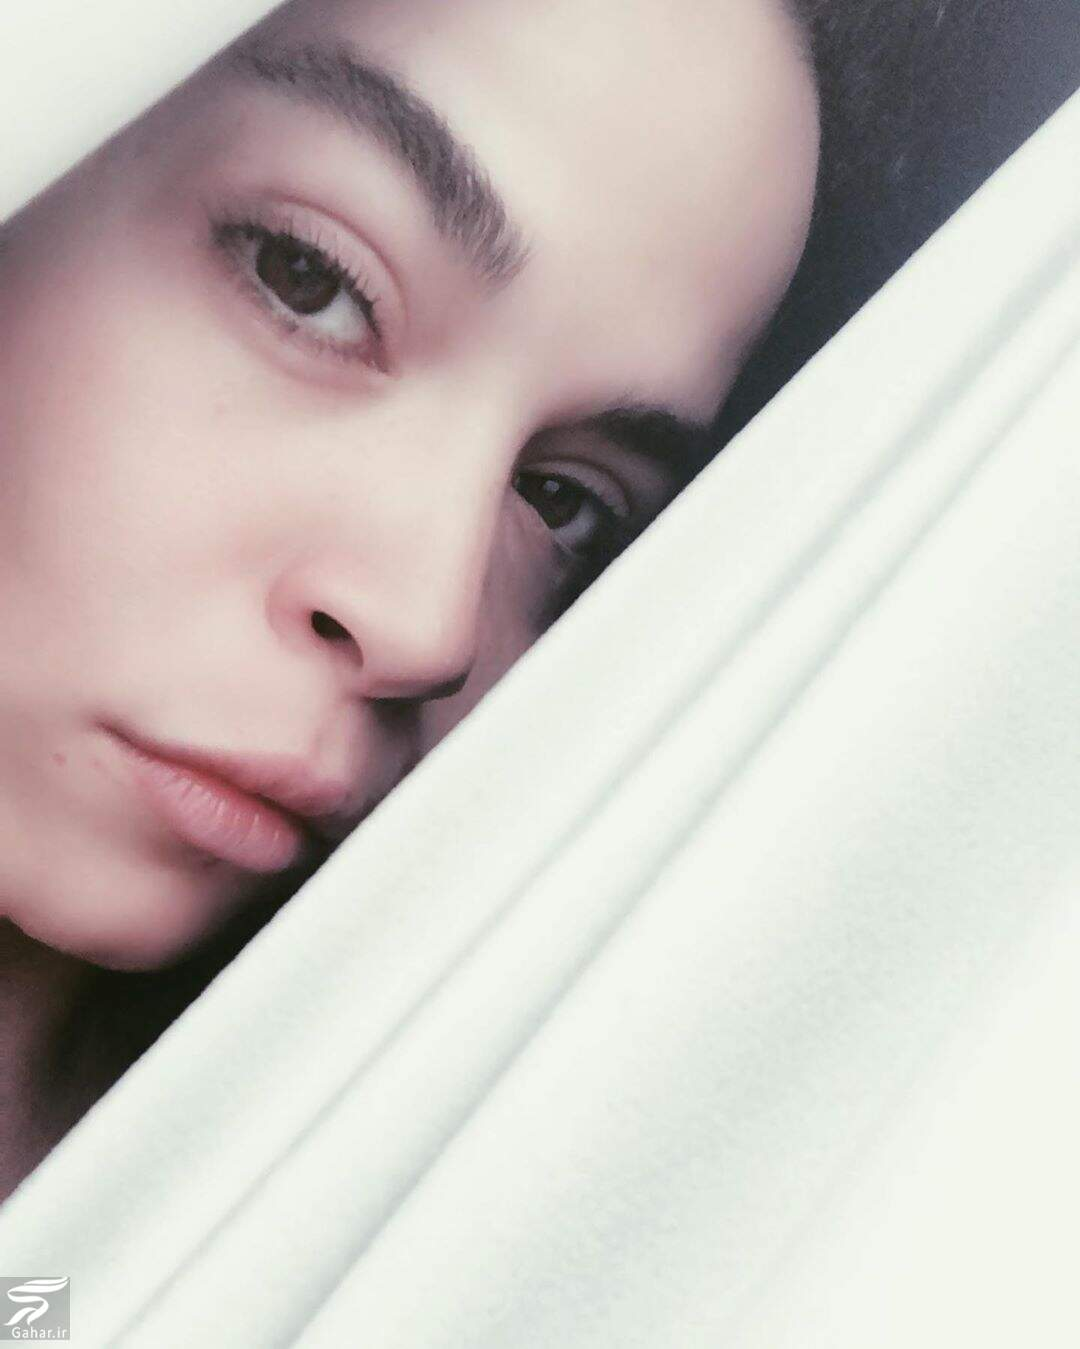 105386724 155538369425629 5145040056145815094 n عکس بدون آرایش ملیکا شریفی نیا با ژست متفاوت